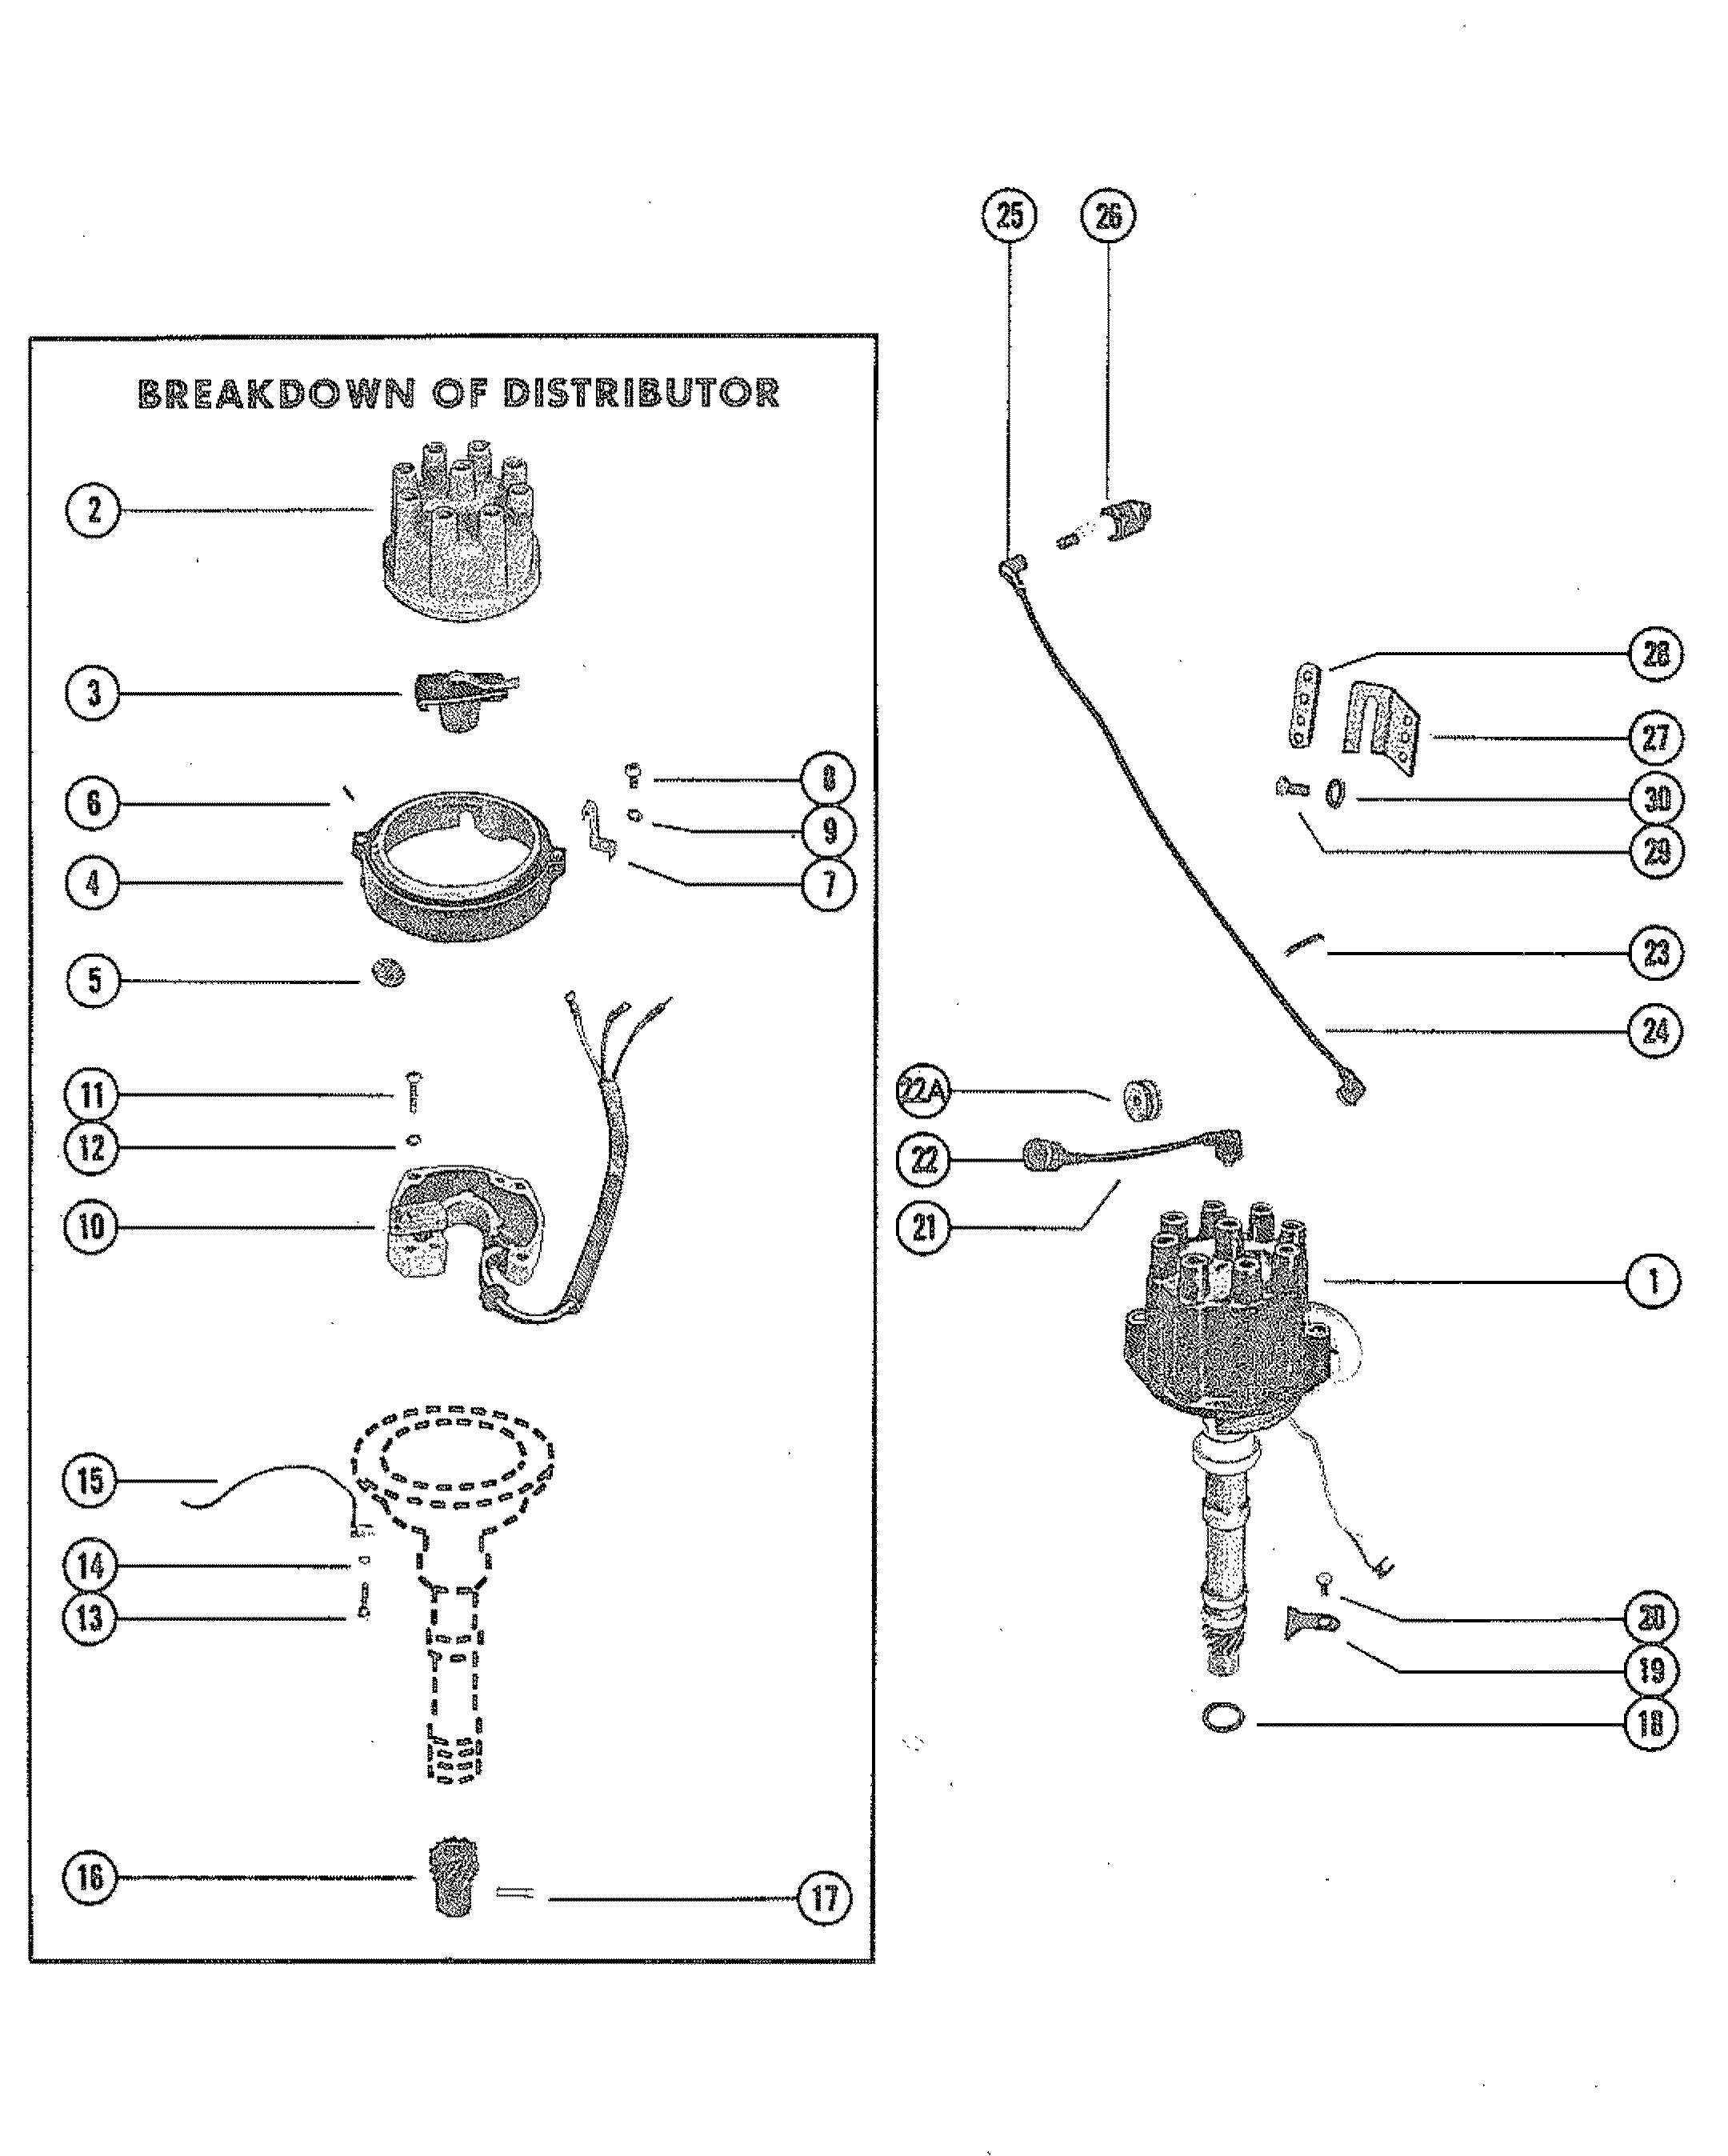 1978 Mercruiser 898 Wiring Diagram Product Diagrams U041a U0430 U0442 U043b U043e U0433 U0437 U043f U0447 U0441 U0435 U0439 U044c U043d U044b